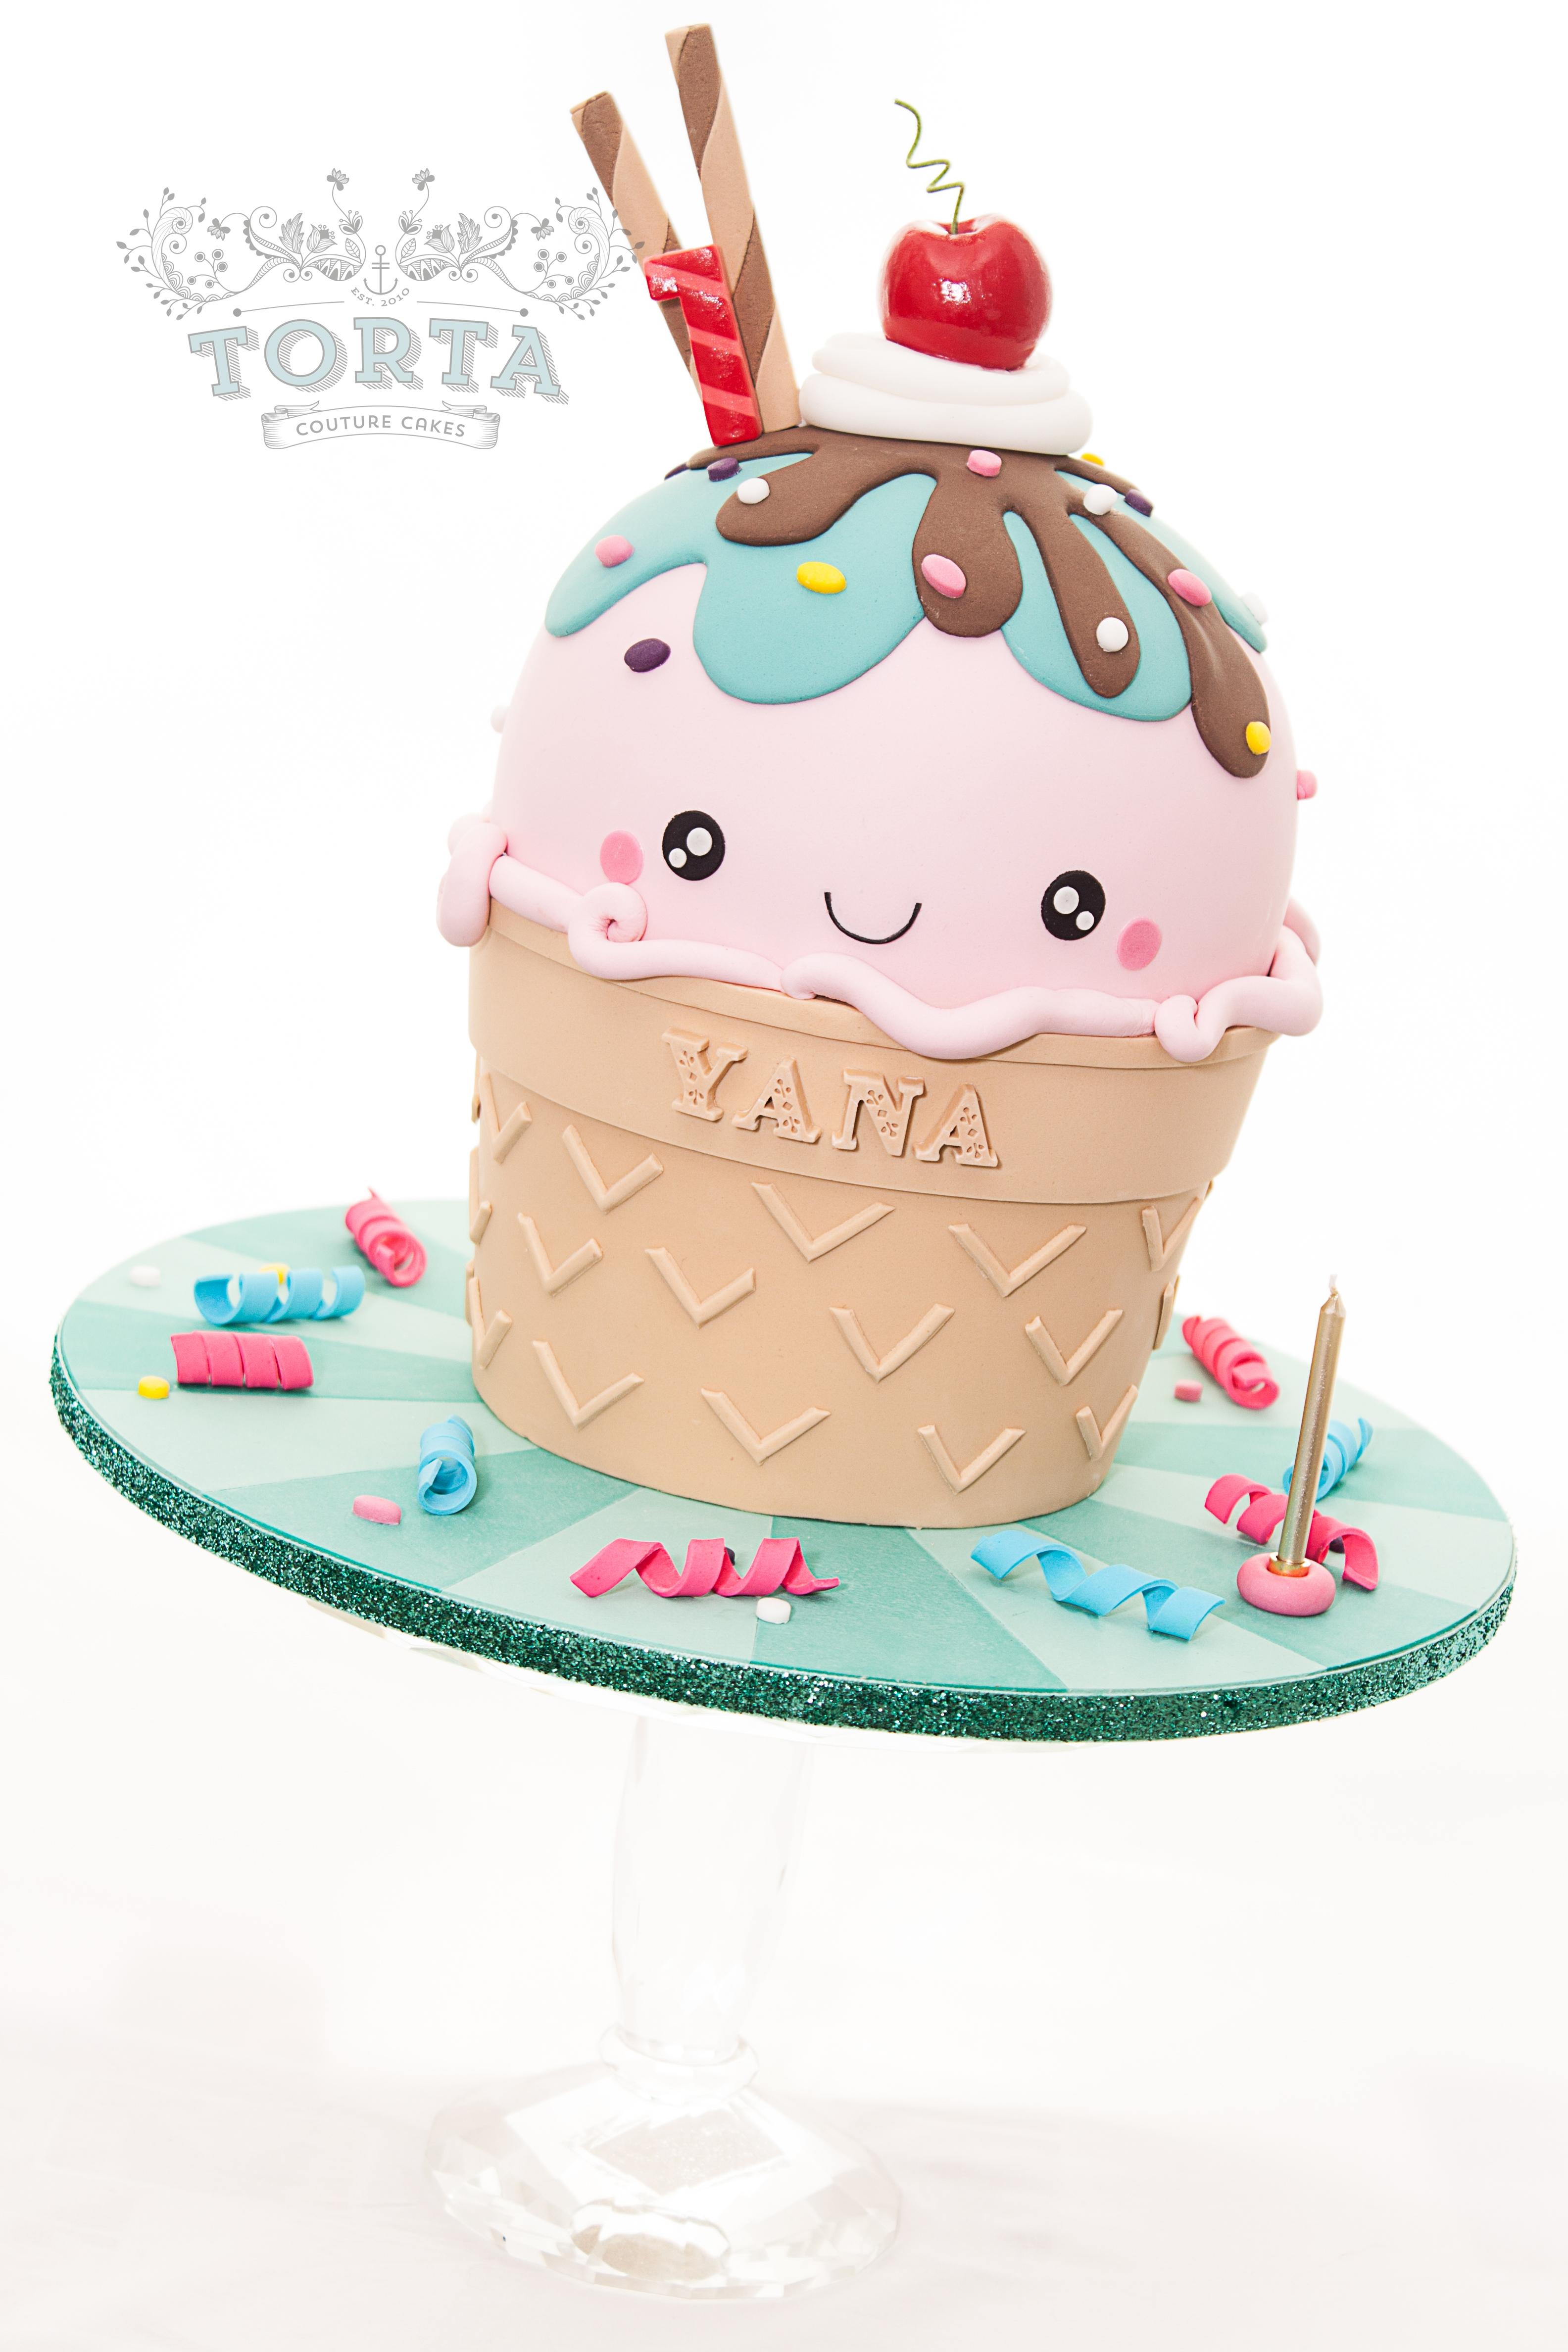 Best Icecream Cake Anime